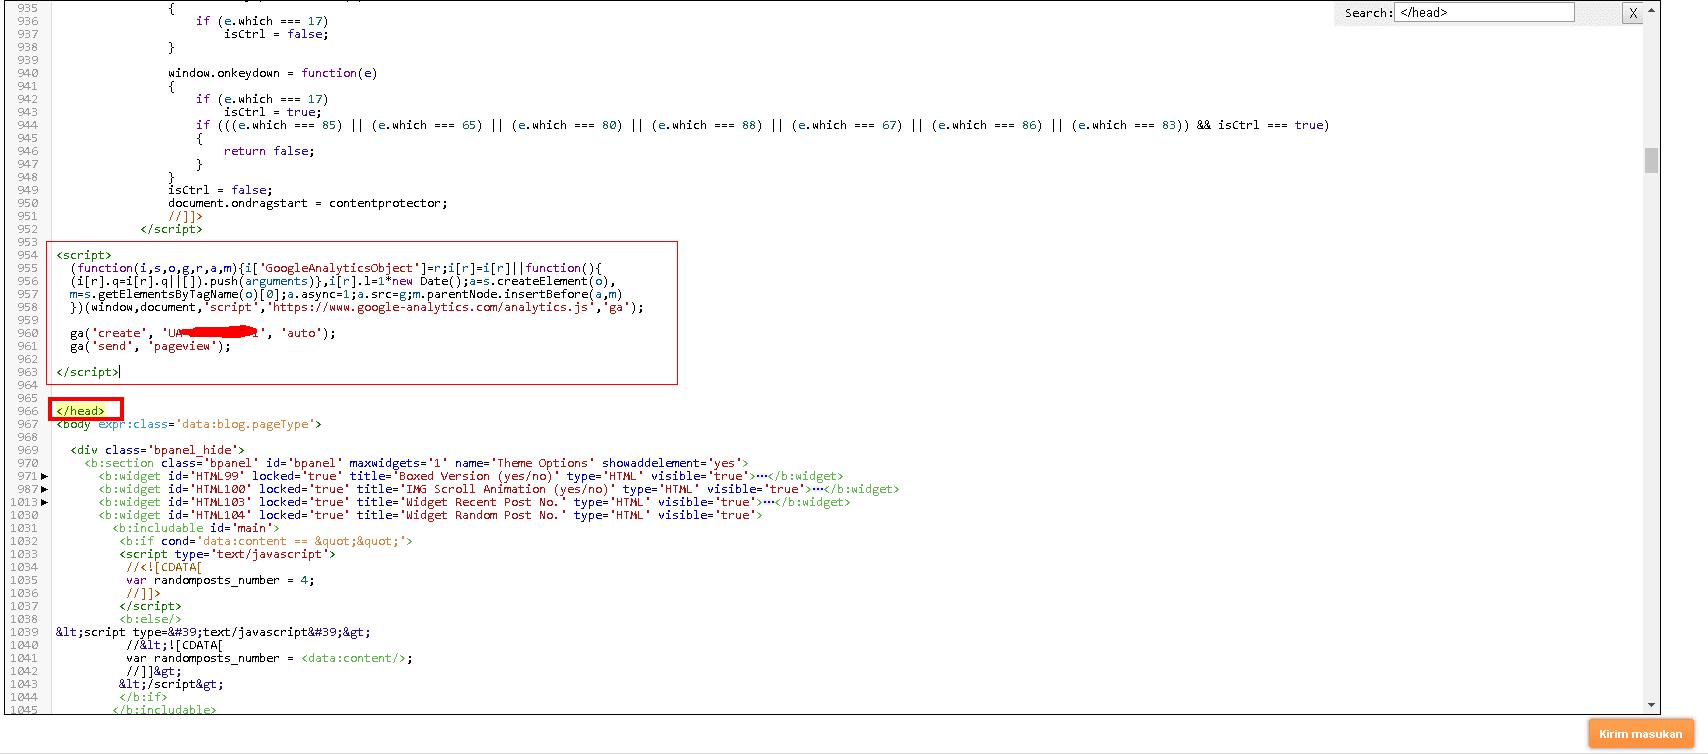 cara memasang google analytic script tracker pada blogger